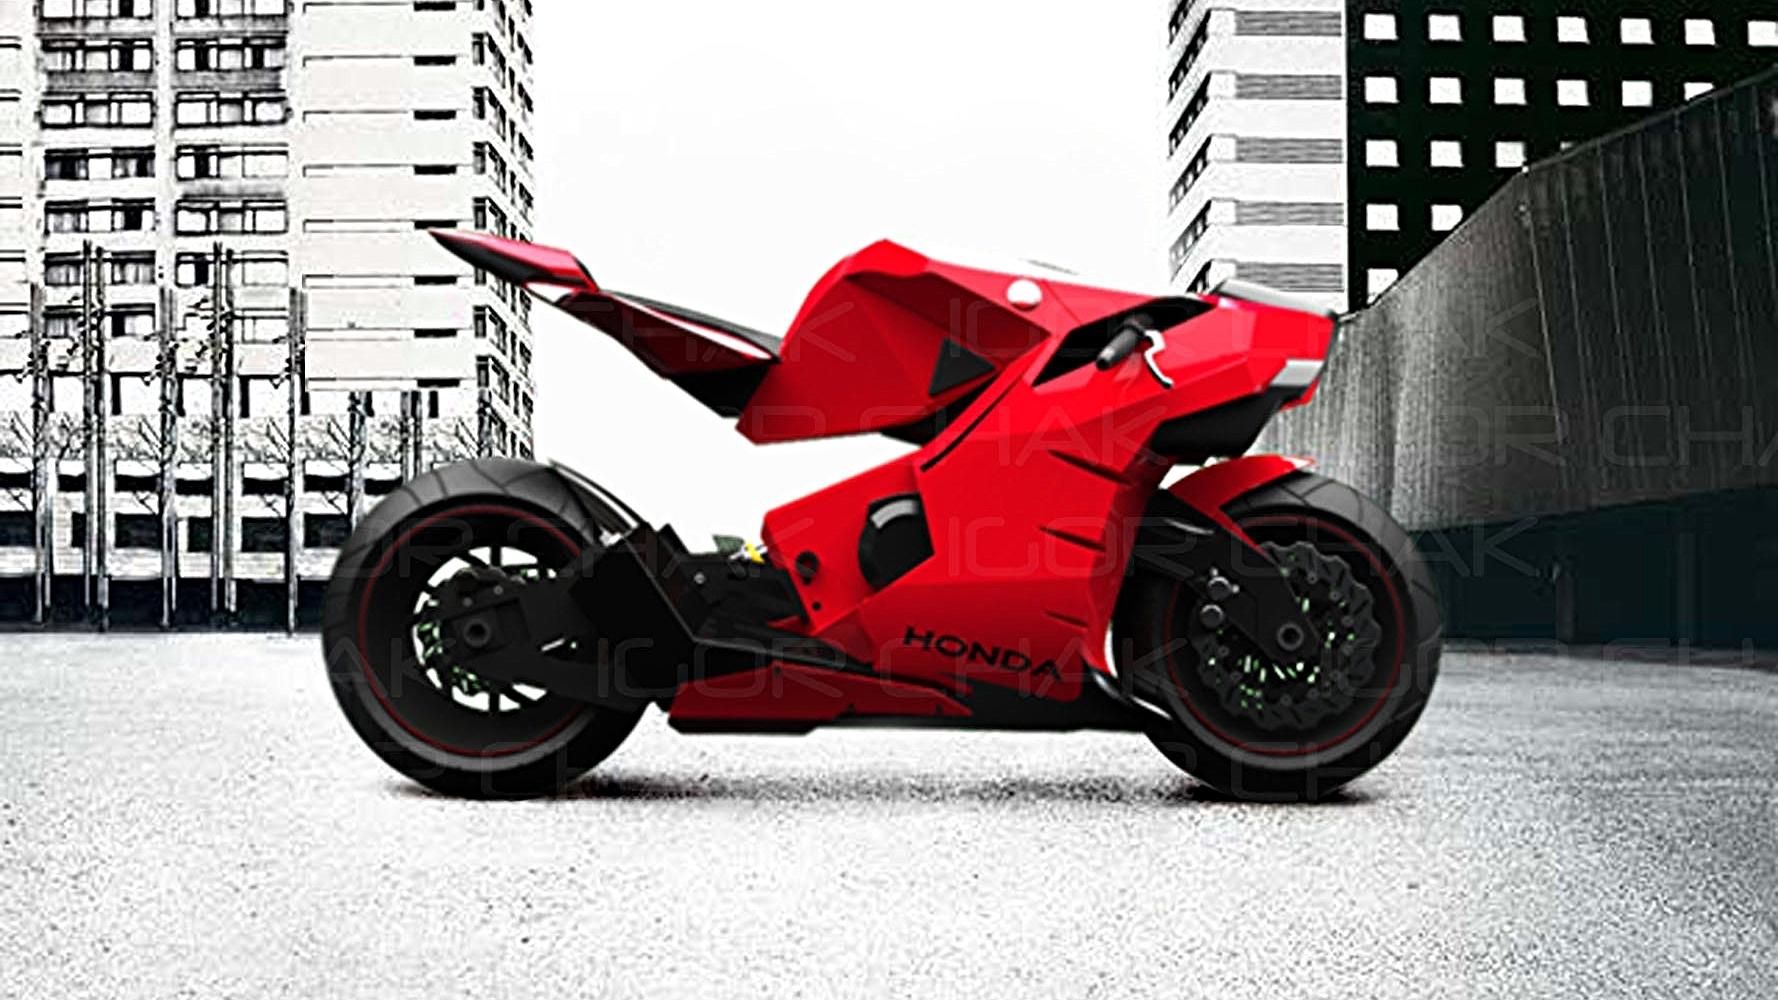 2015 Honda CB750 Concept